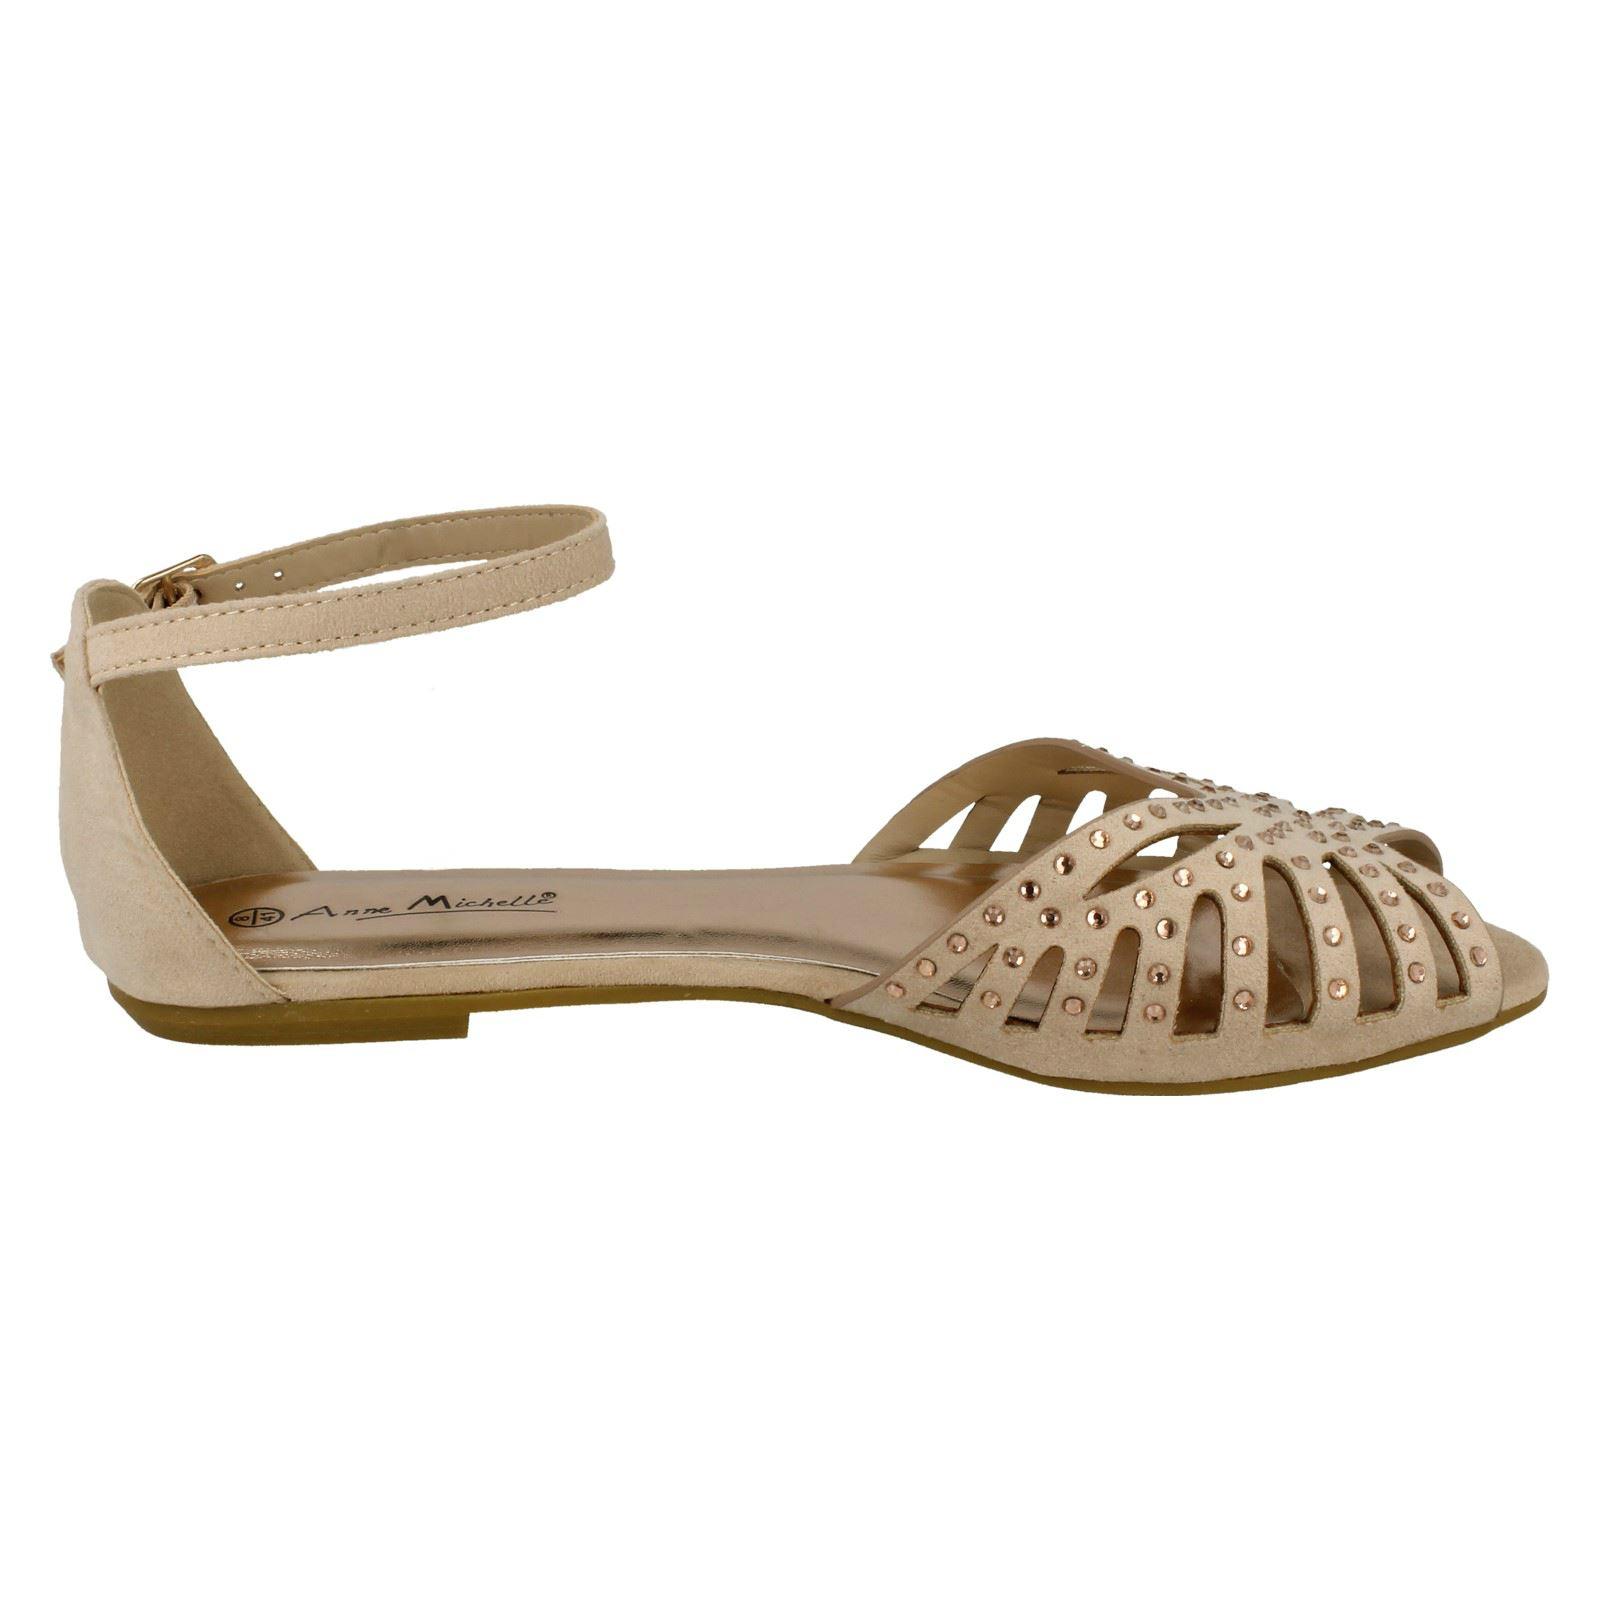 Sandalias Planas Diamante Embellecedor señoras de bambú L6750